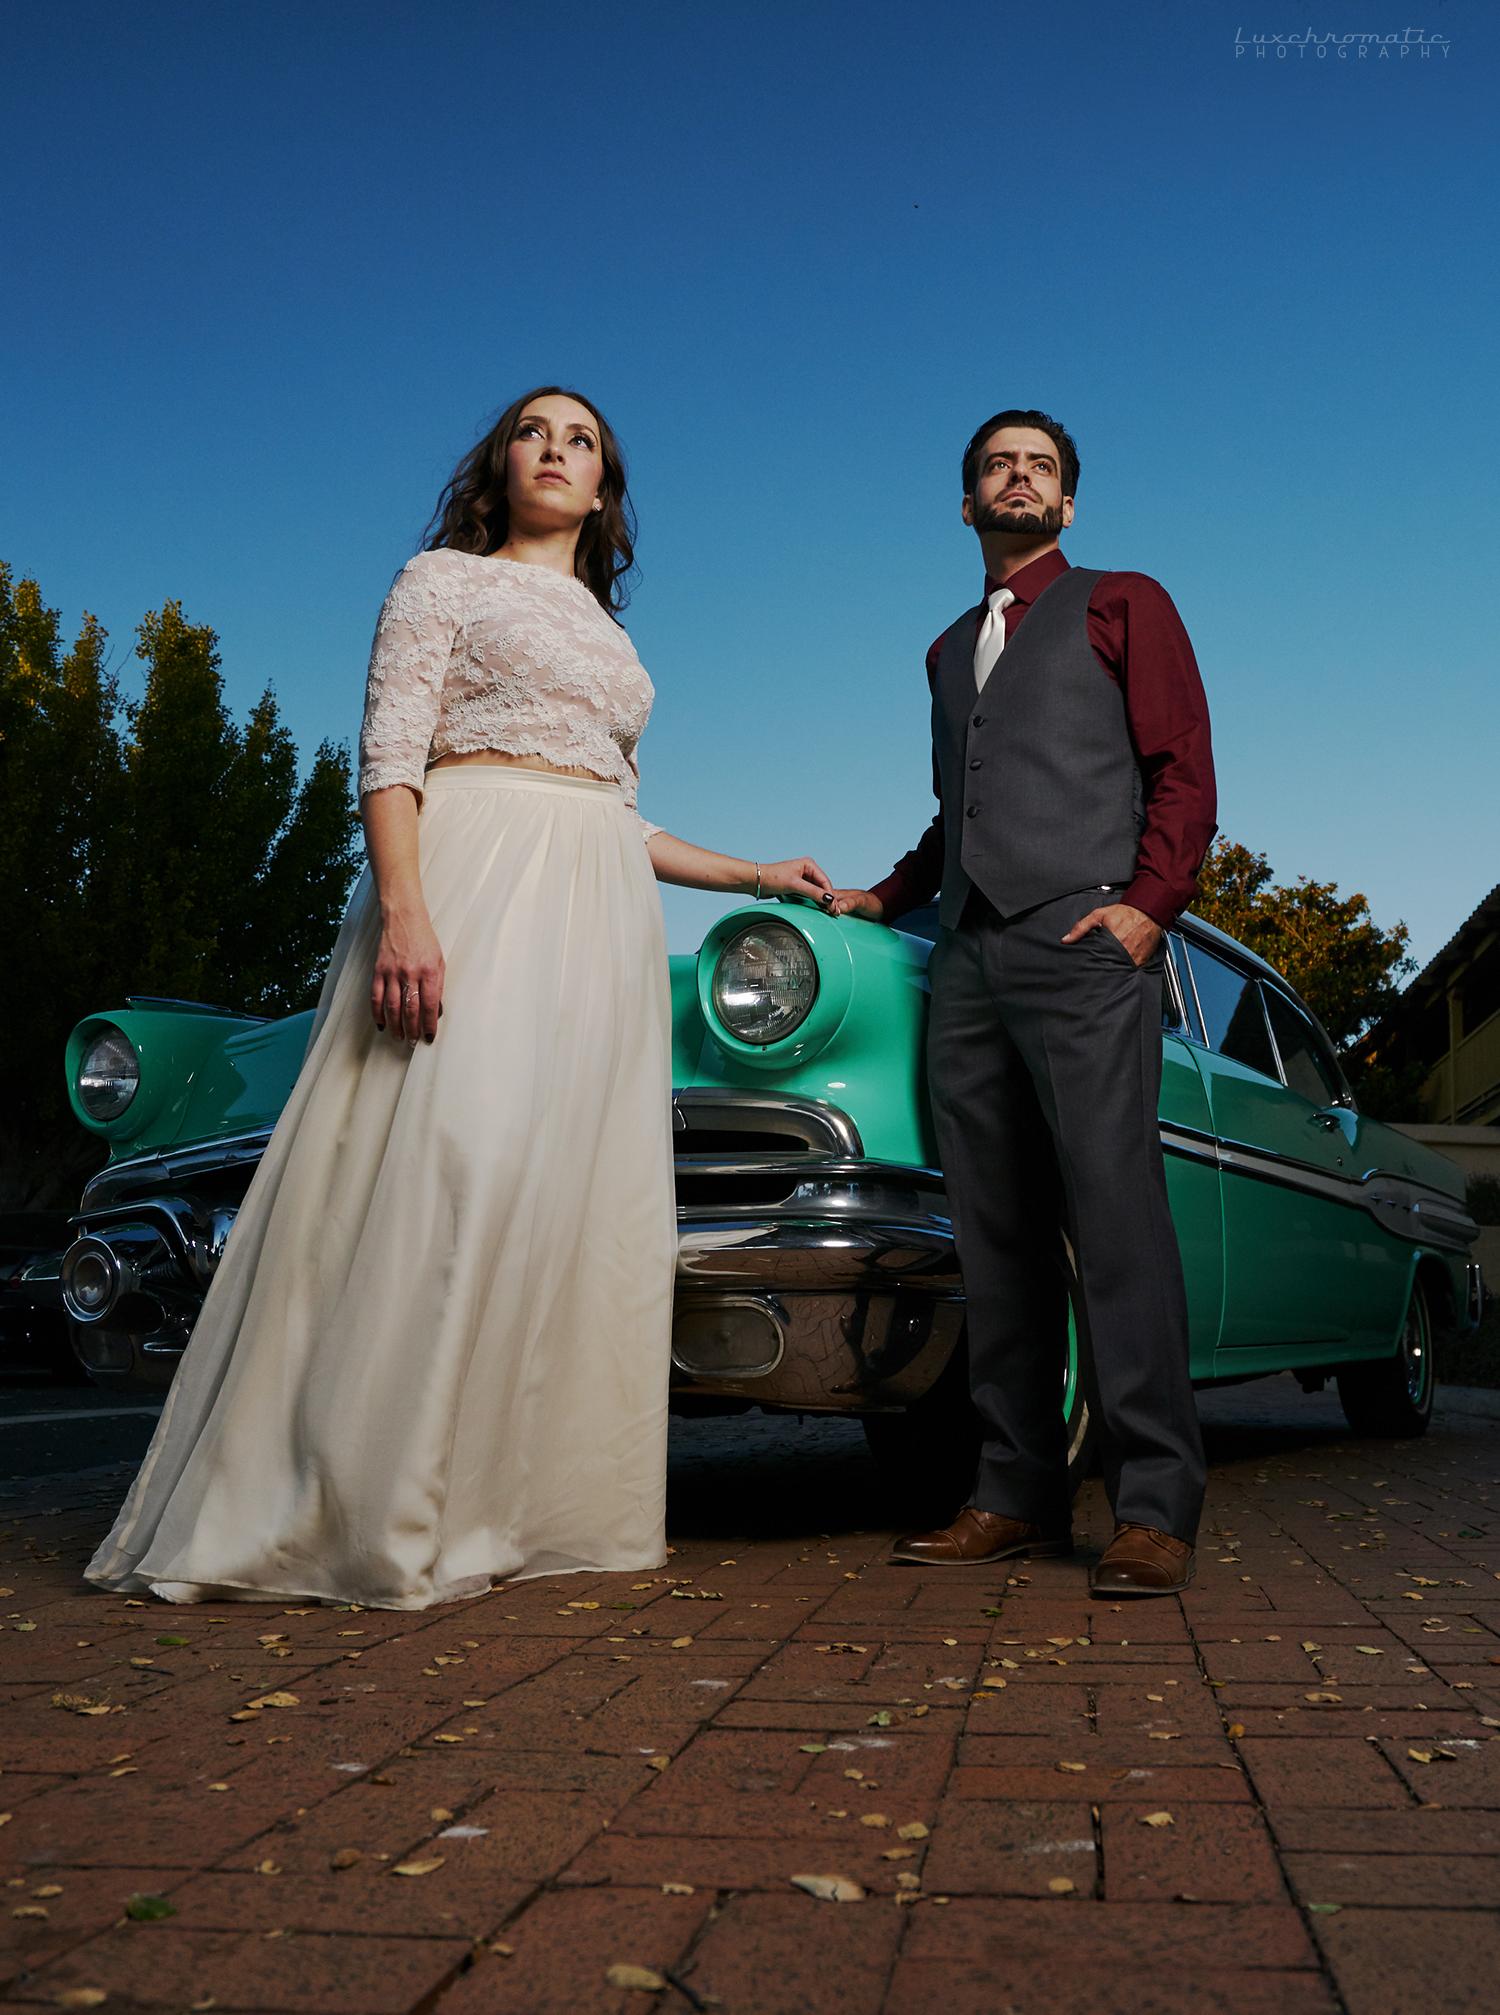 100717_Lenora_Jesse0729-weddingdress-bride-weddingphotography-best-weddingphotographer-bridal-groom-wedding-engagementring-proposal-brides-diamondring-sonyalpha-sony-sonya7rii-sanfrancisco-sf-bayarea-photographer-profoto-berkeley-botanical-garden.jpg